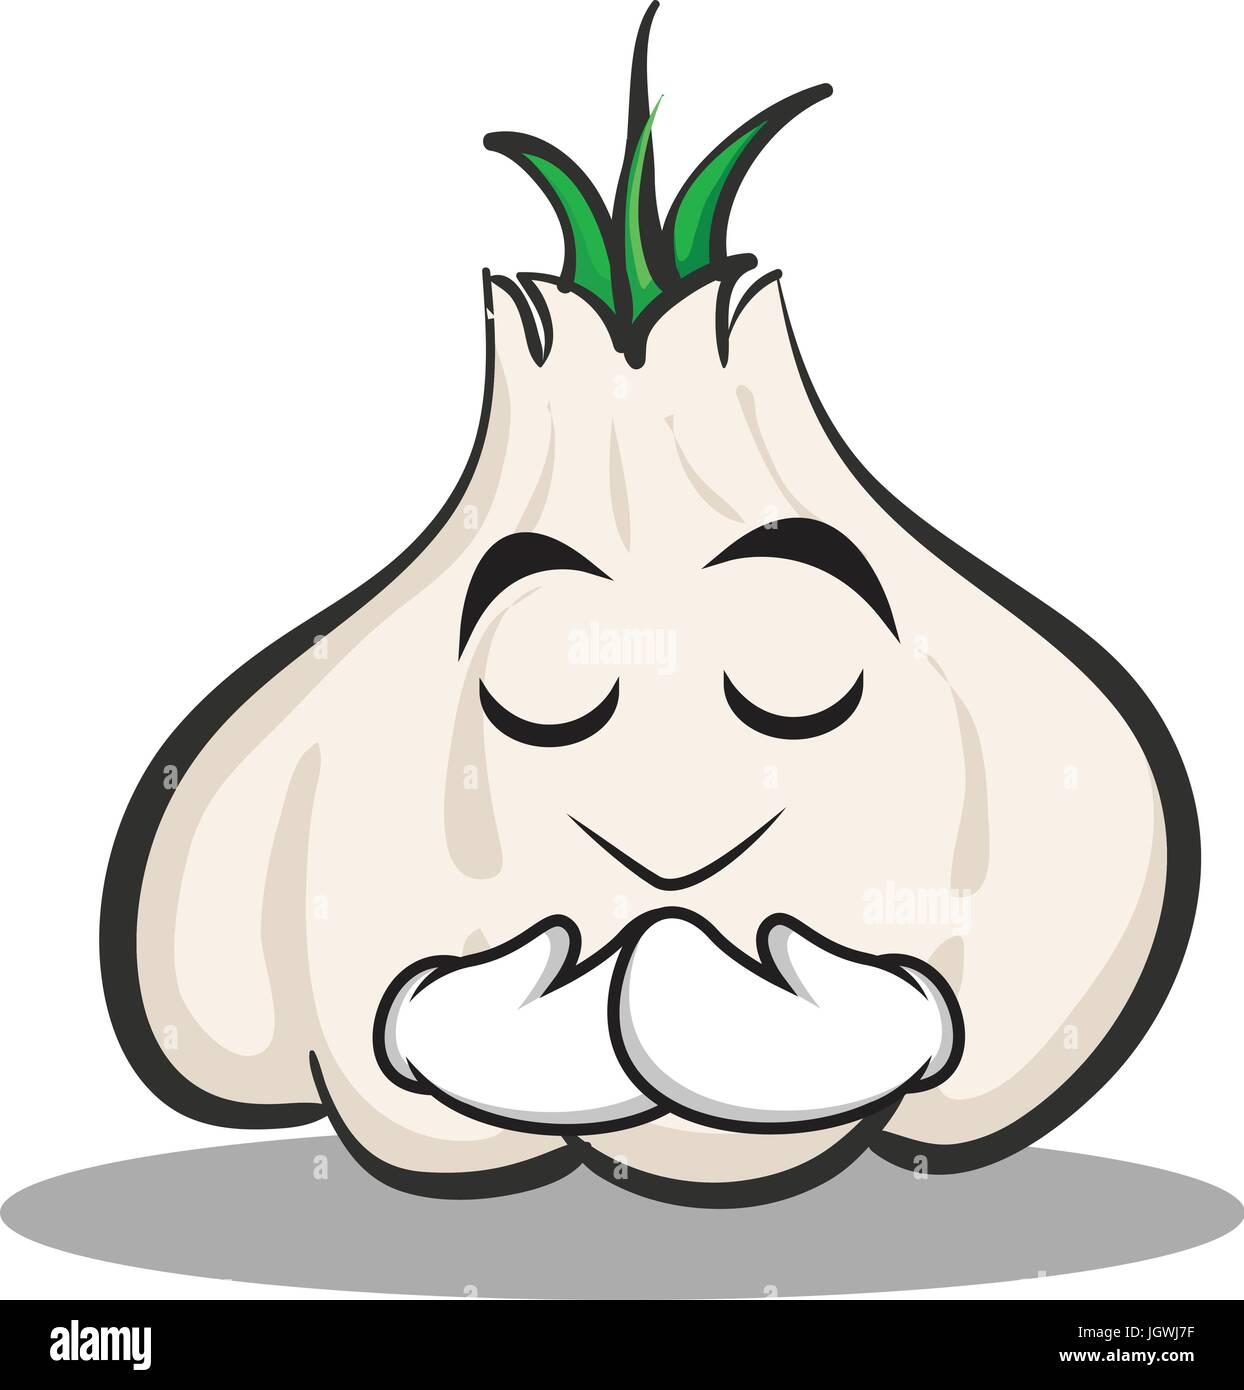 Praying garlic cartoon character - Stock Vector